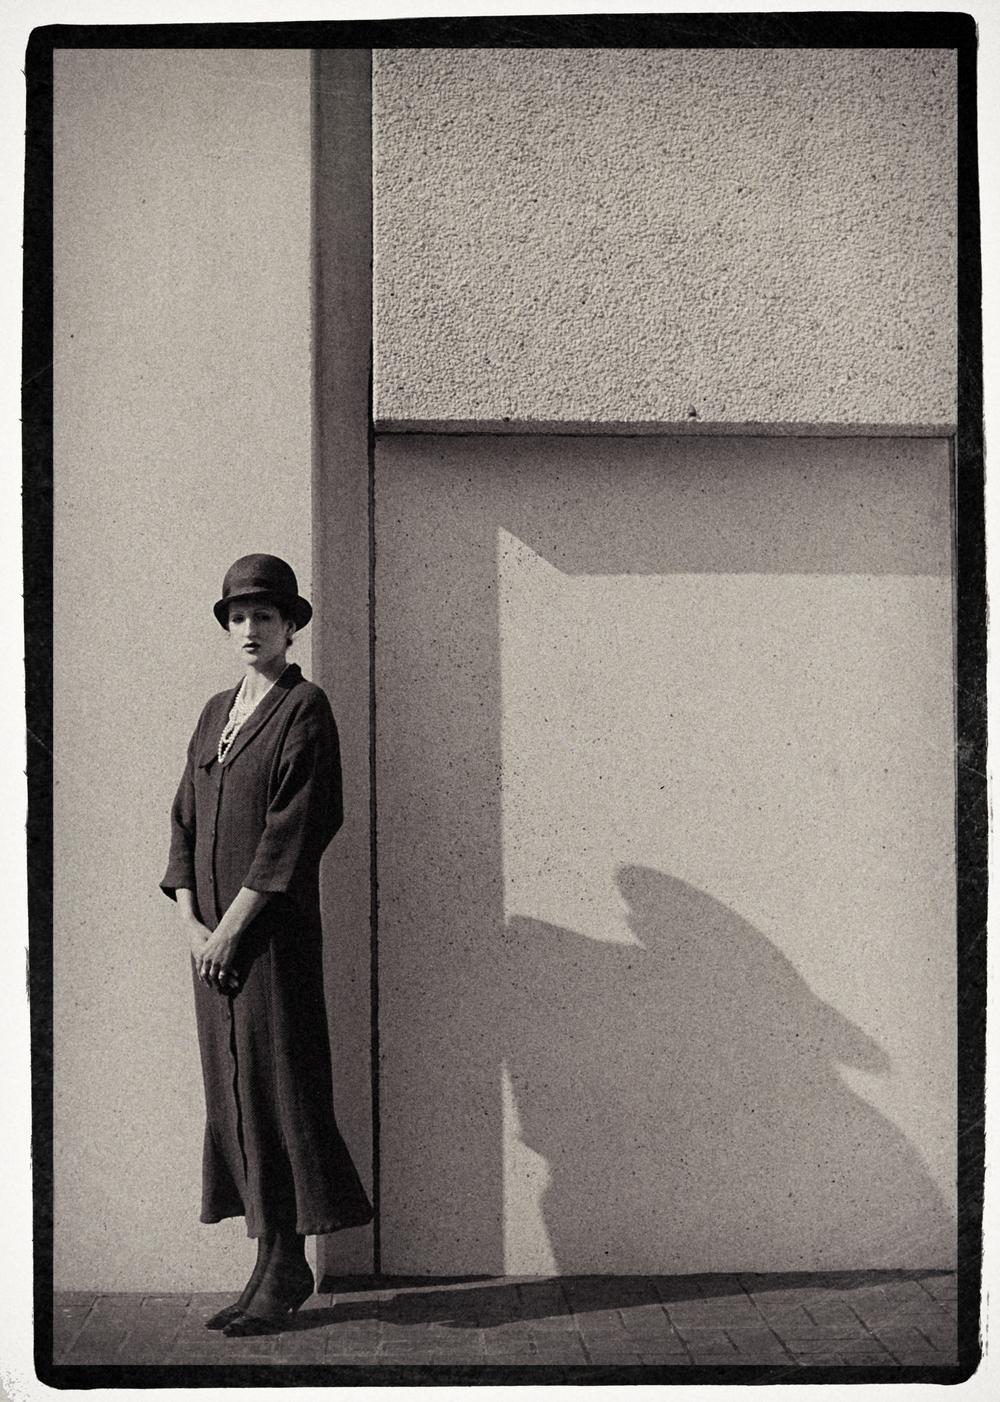 Stephanie, Kensington 1985.